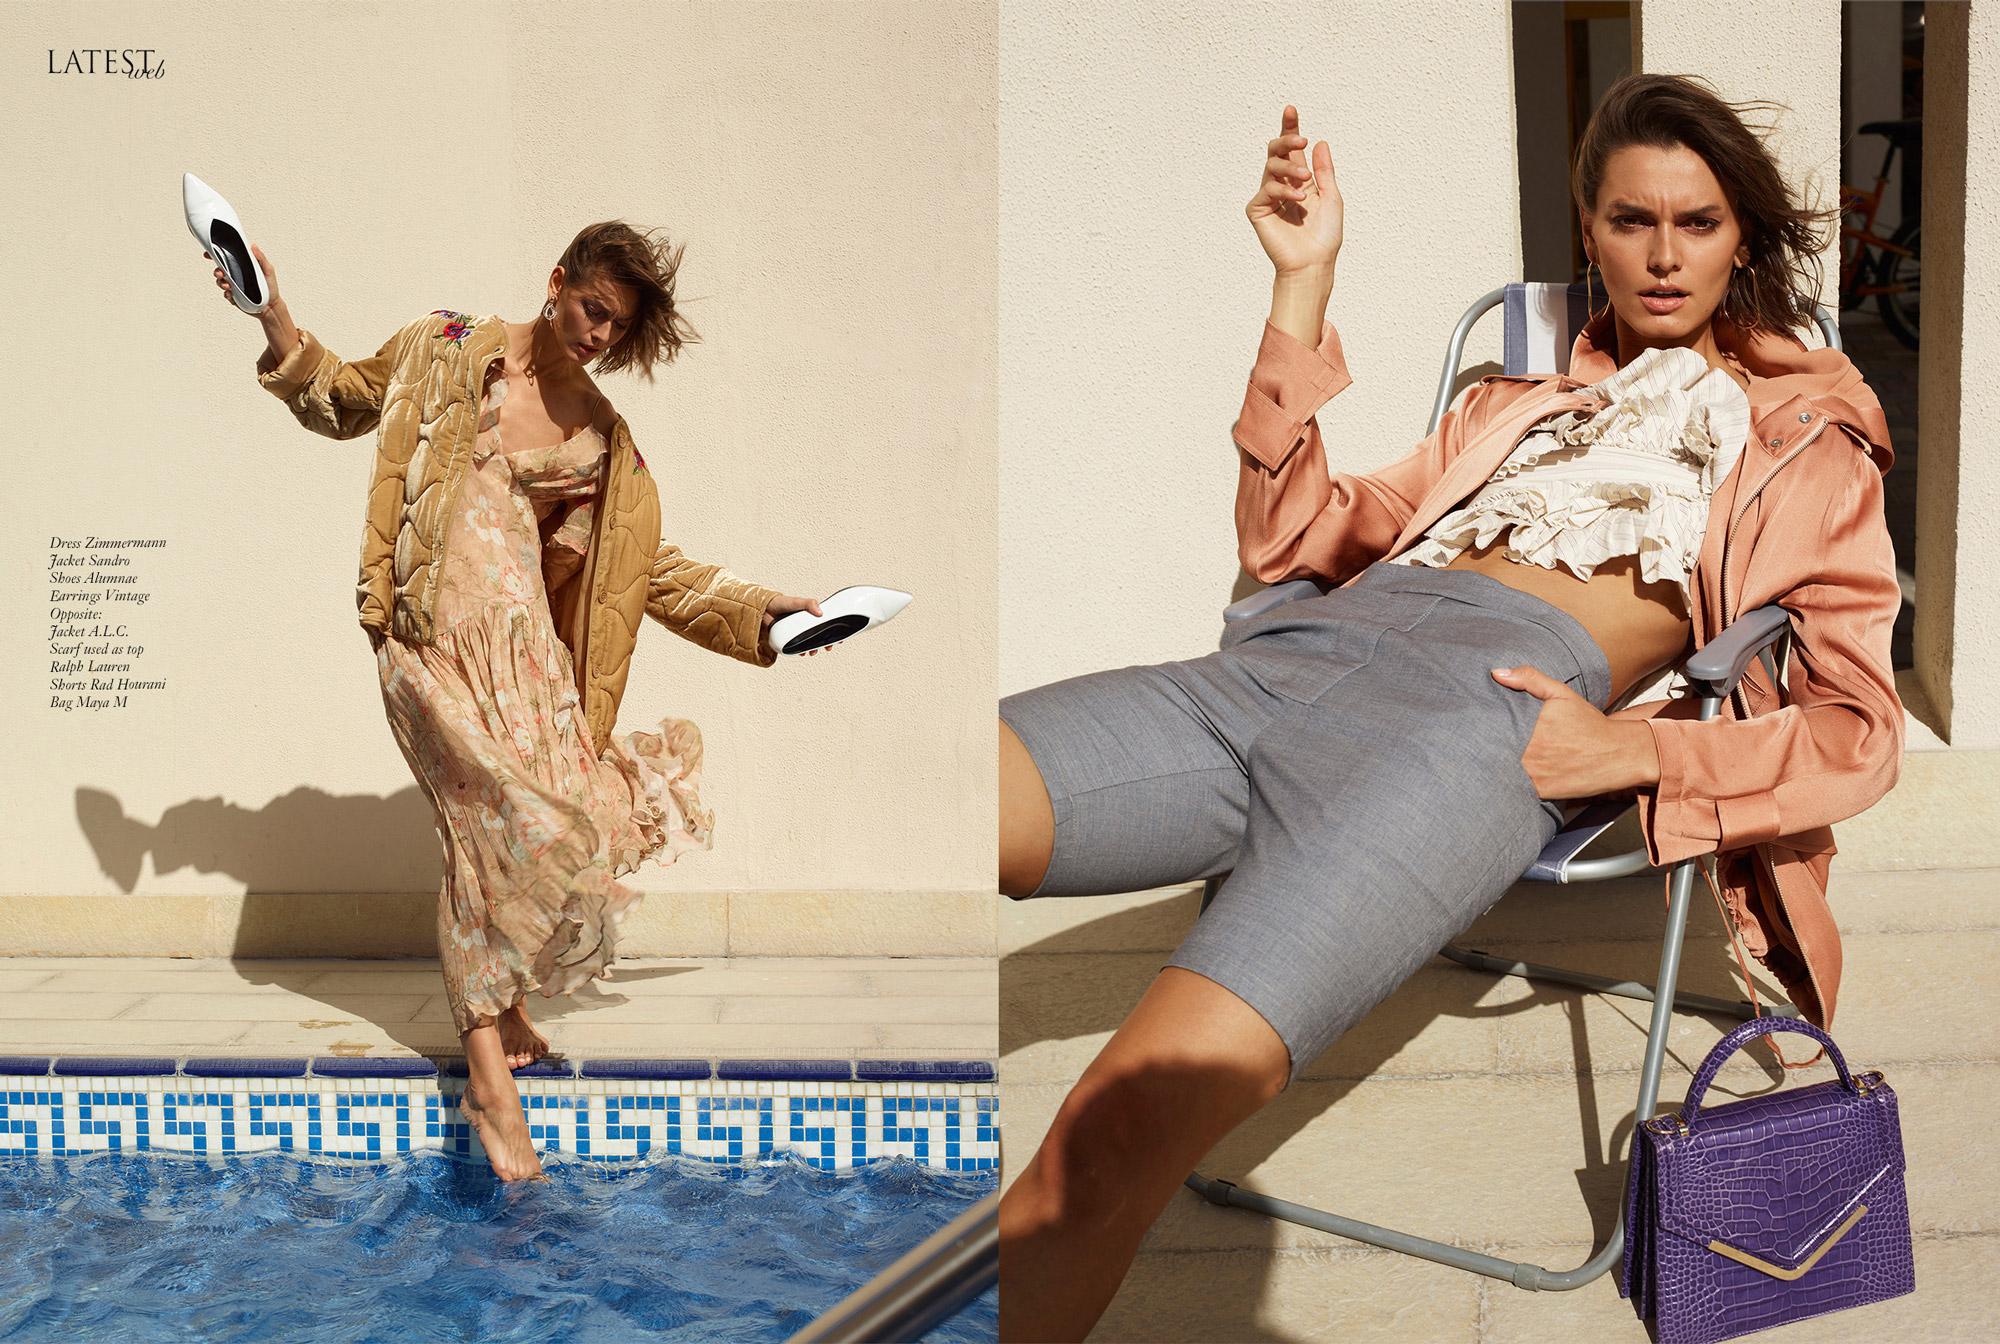 Memories, Klaudia Zdanowicz, model by the pool in  Dubai editorial for Latest magazine. By Ioannis Koussertari